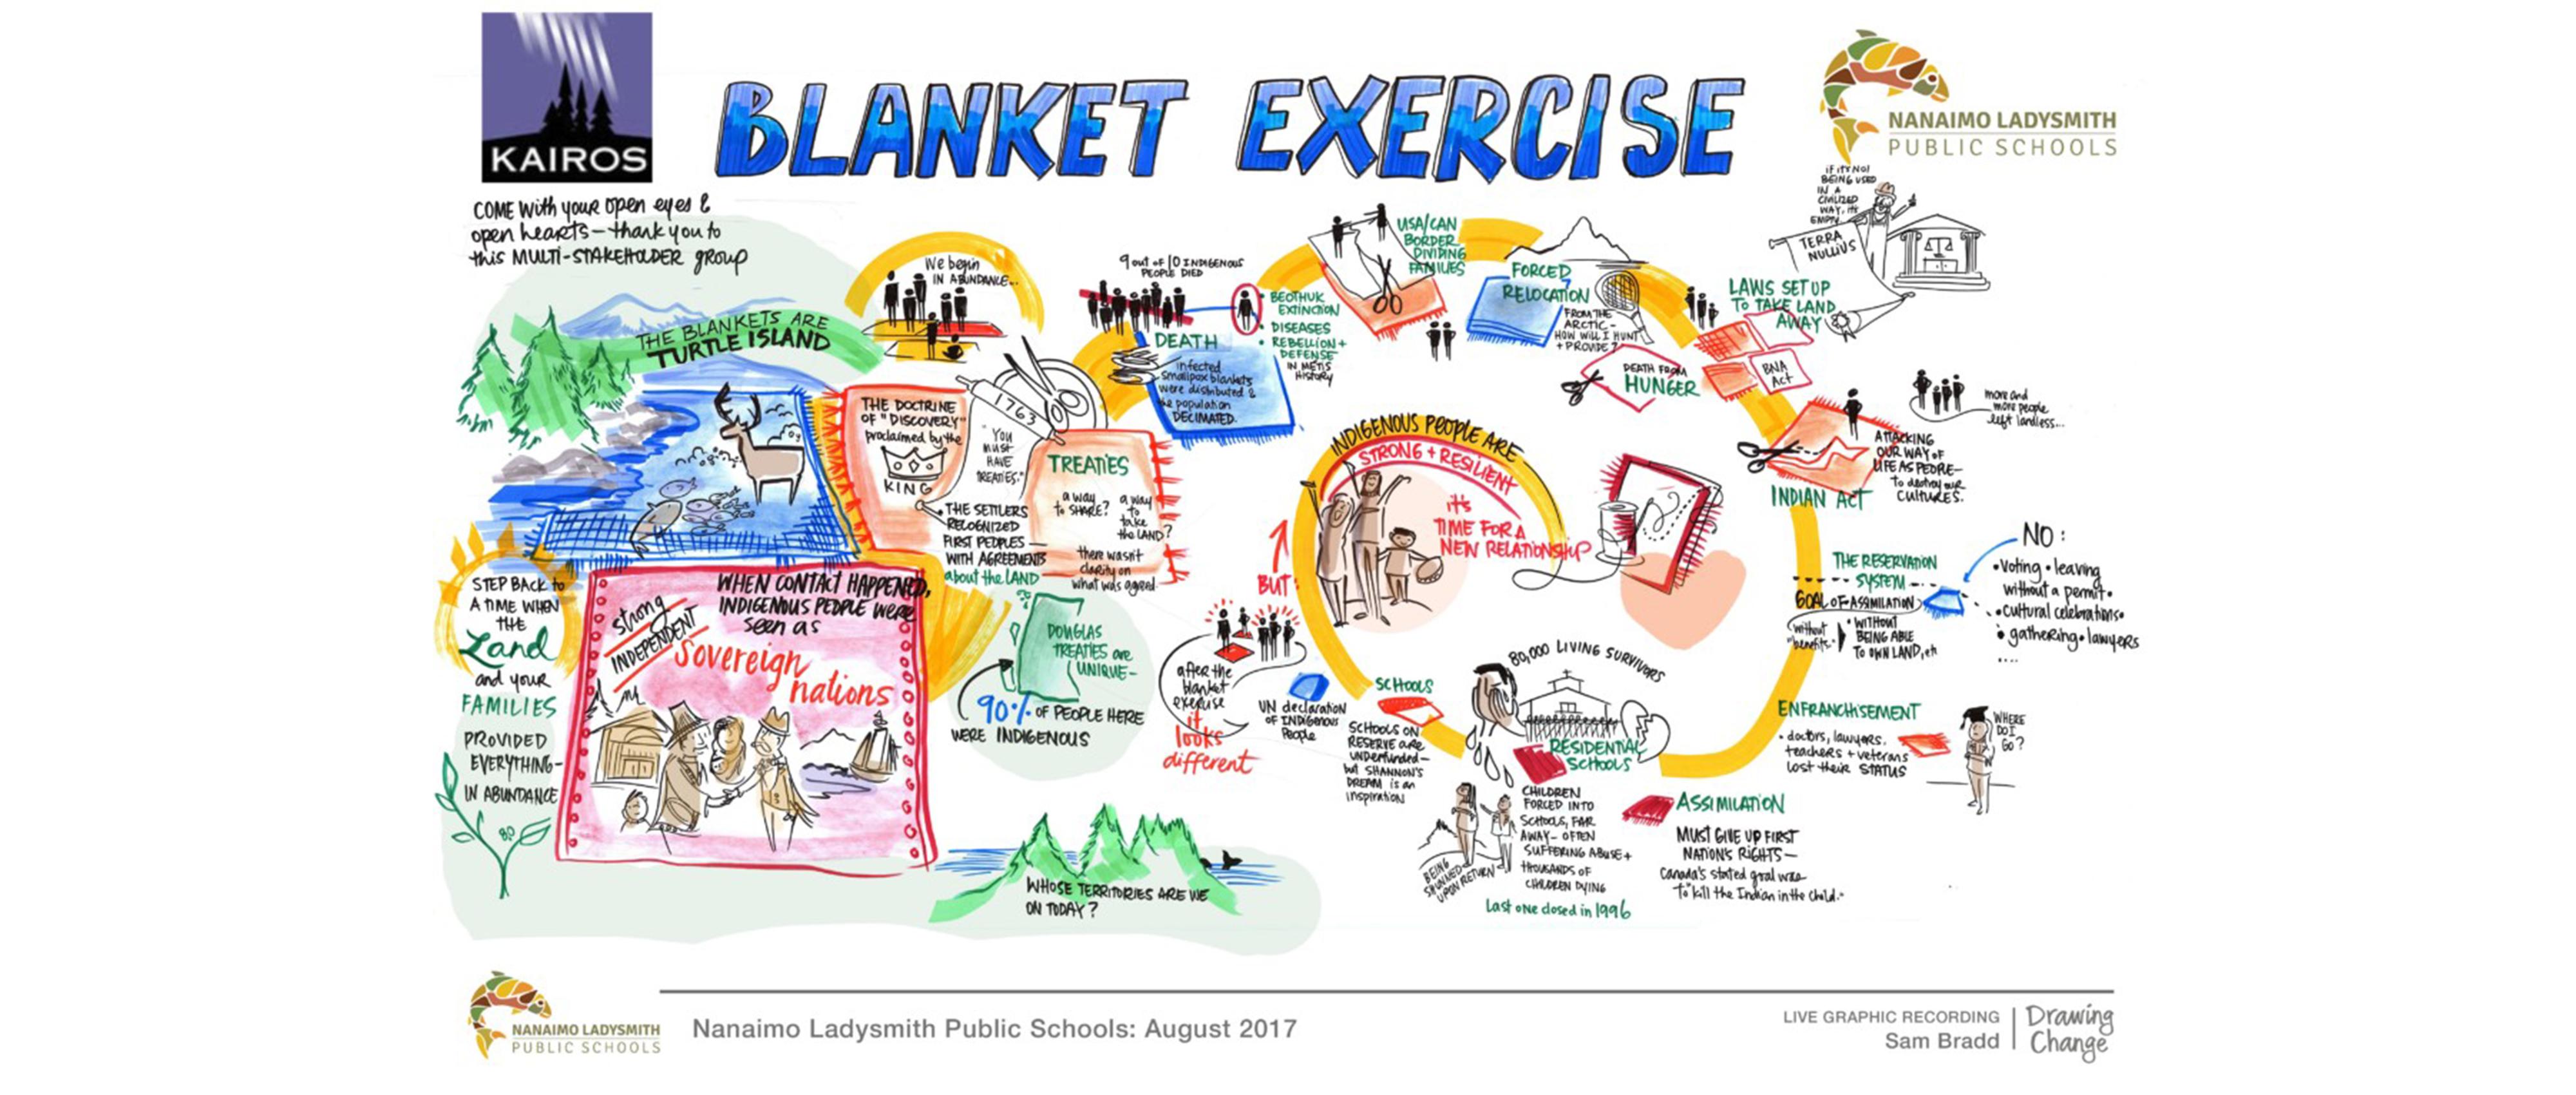 Blanket exercise graphic recording